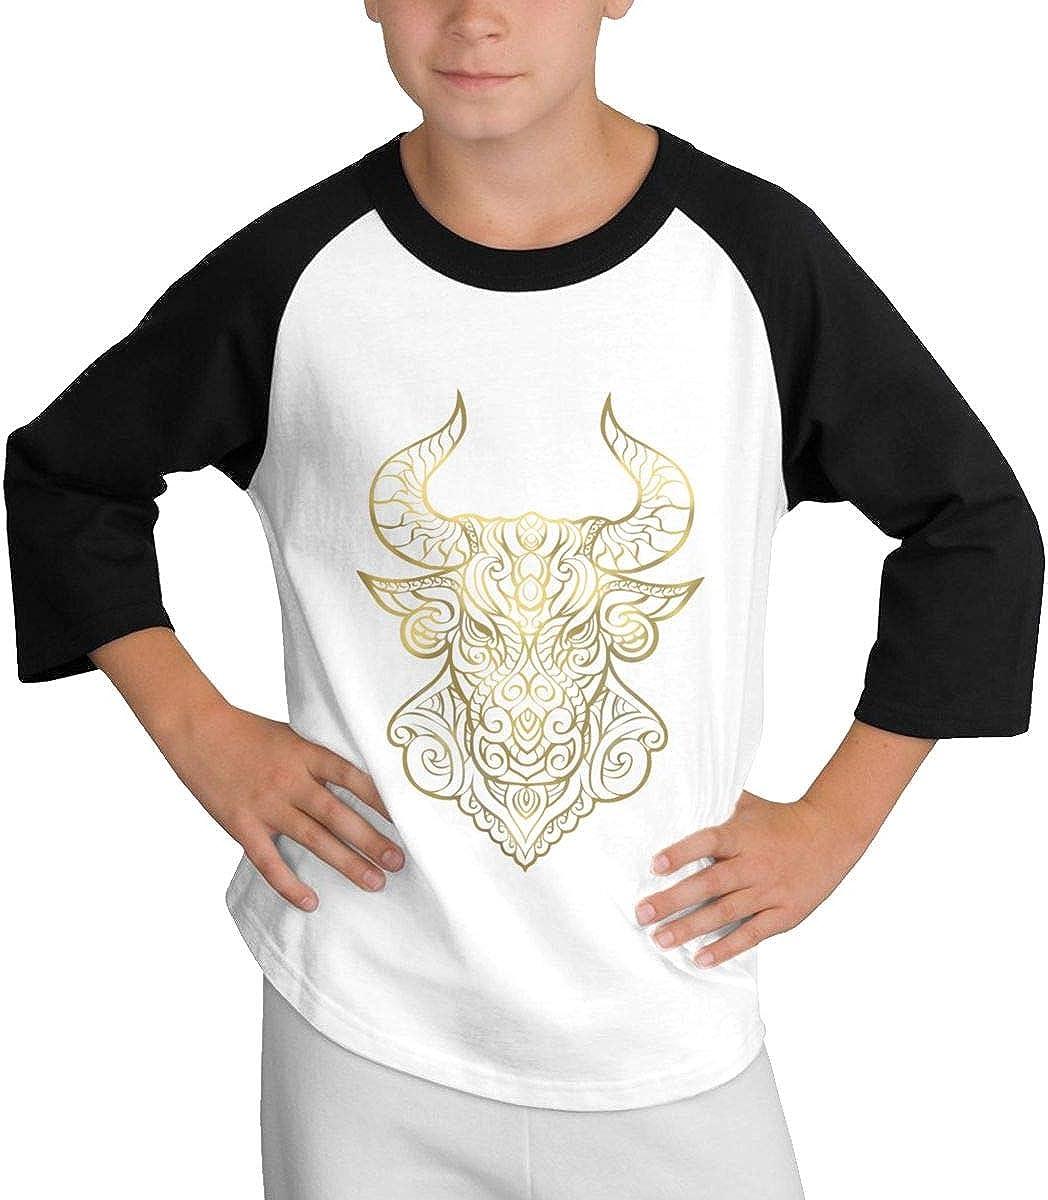 Qiop Nee Taurus Gold Raglan 3//4 Short-Sleeves T-Shirt Youth Girls Boys